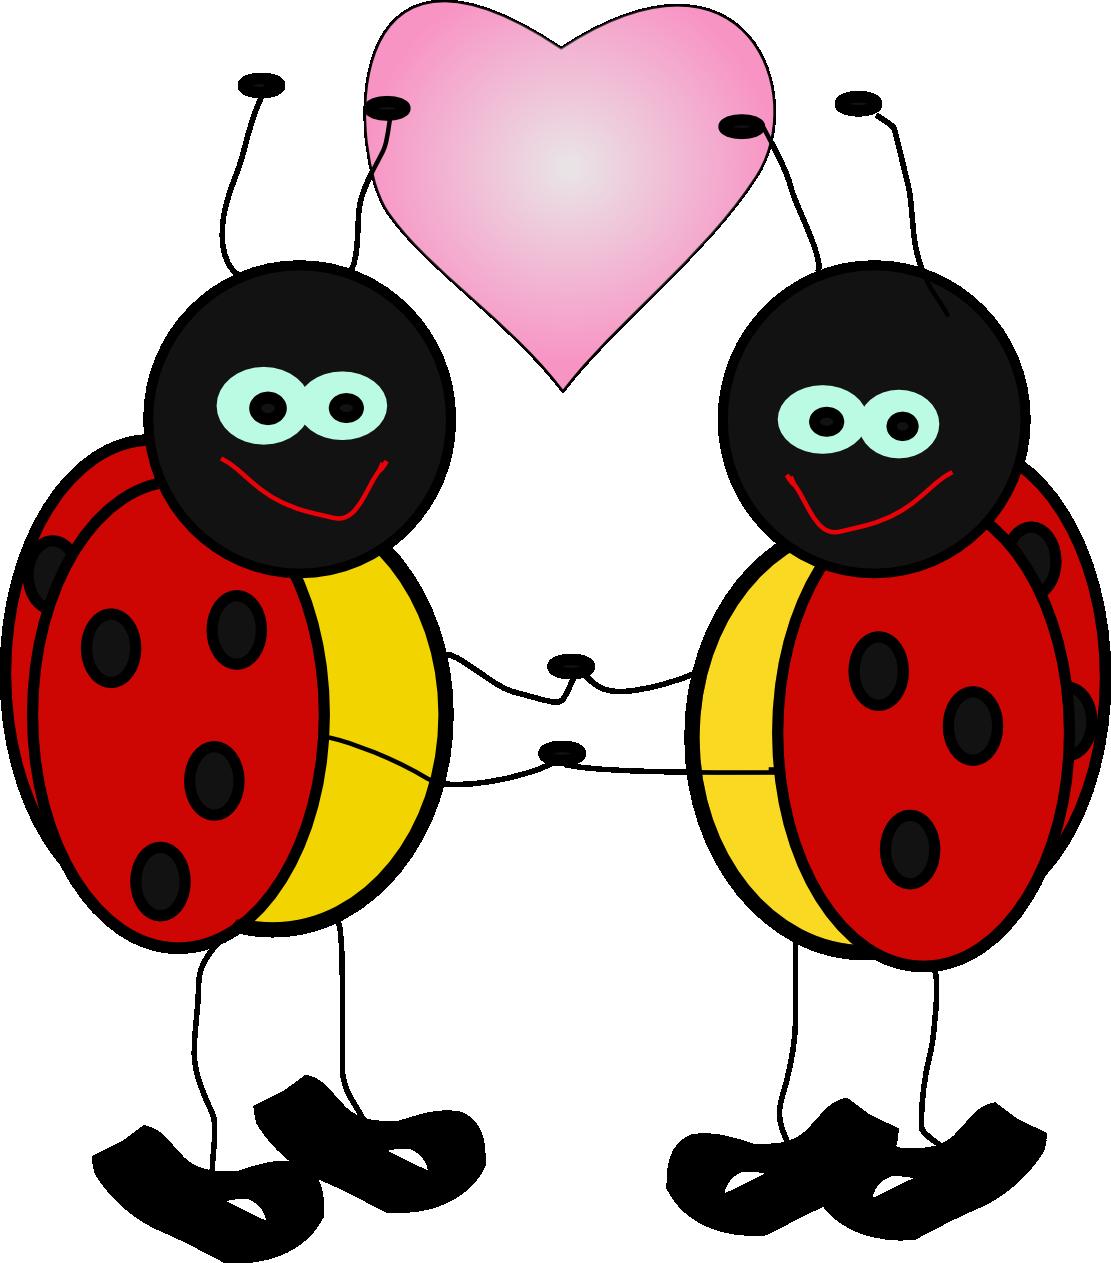 love transparent png. Ladybugs clipart classroom decoration